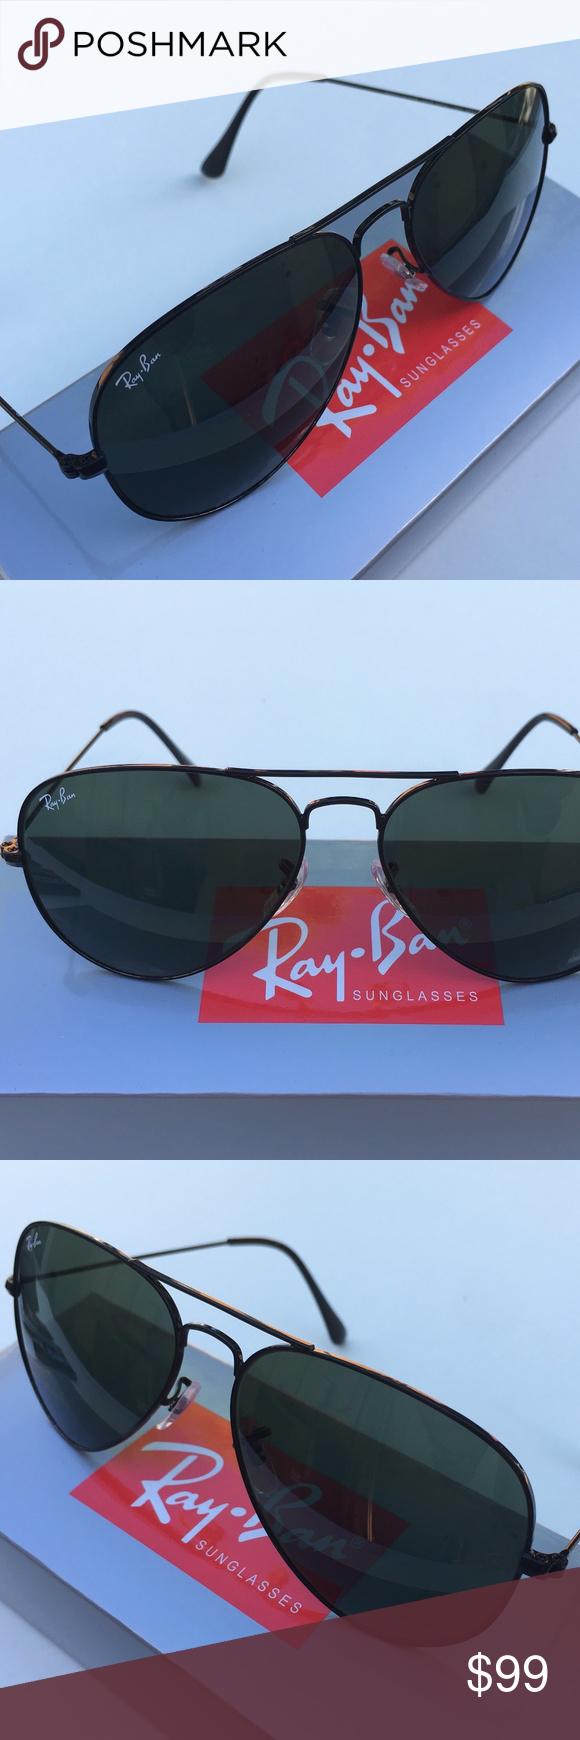 284f77744e72d NEW RAY-BAN AVIATOR Sunglasses Green Classic Black 100% AUTHENTIC   BRAND  NEW